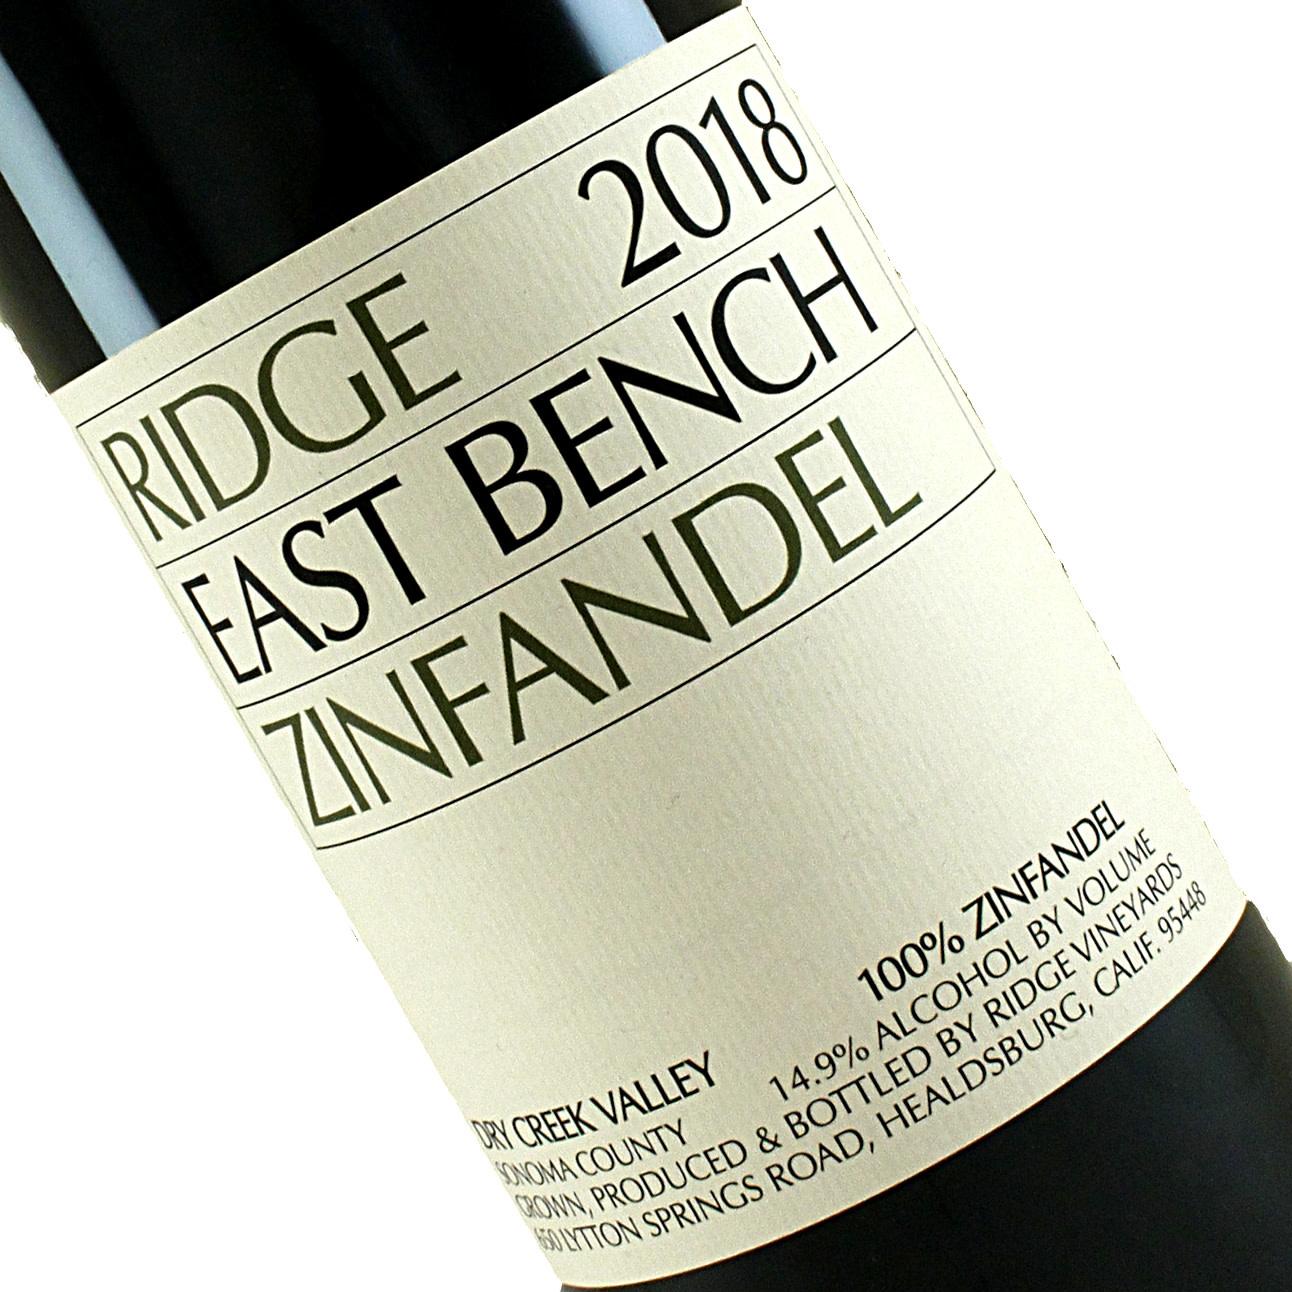 Ridge 2018 East Bench Zinfandel, Healdsburg, Sonoma